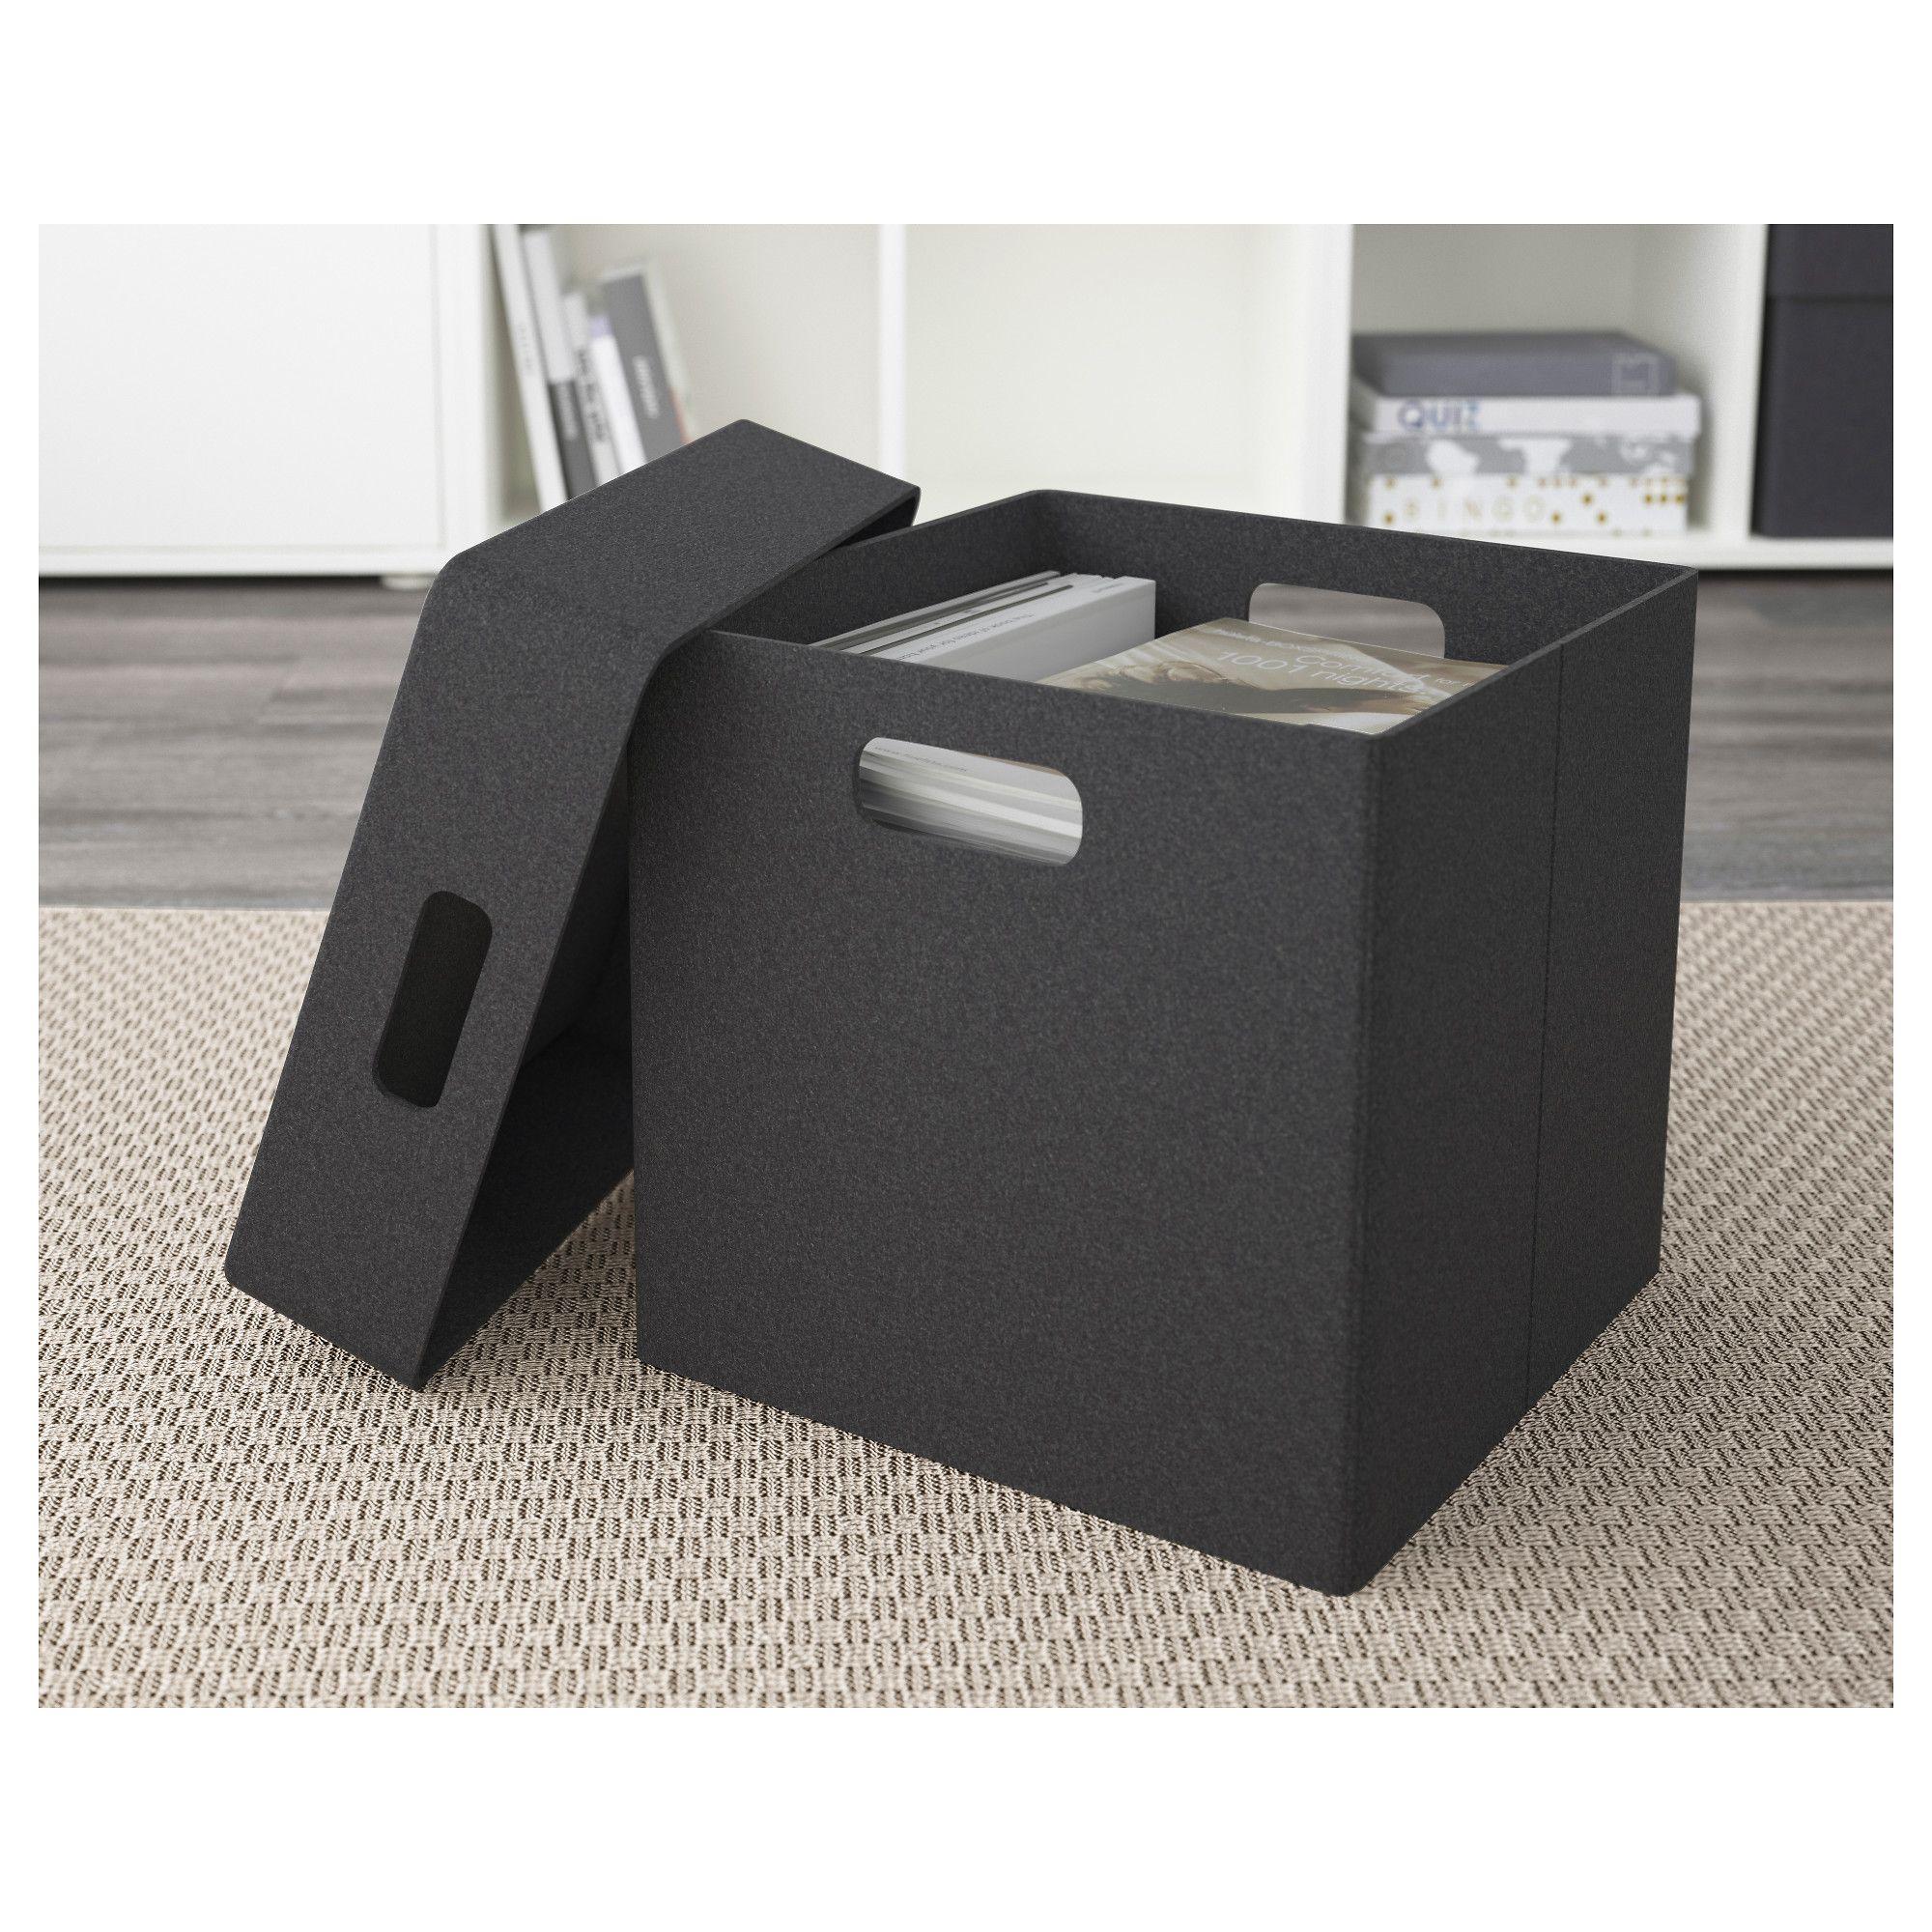 IKEA EKET box Flexible storage for your small items.  sc 1 st  Pinterest & IKEA EKET box Flexible storage for your small items. | Soverom ... Aboutintivar.Com